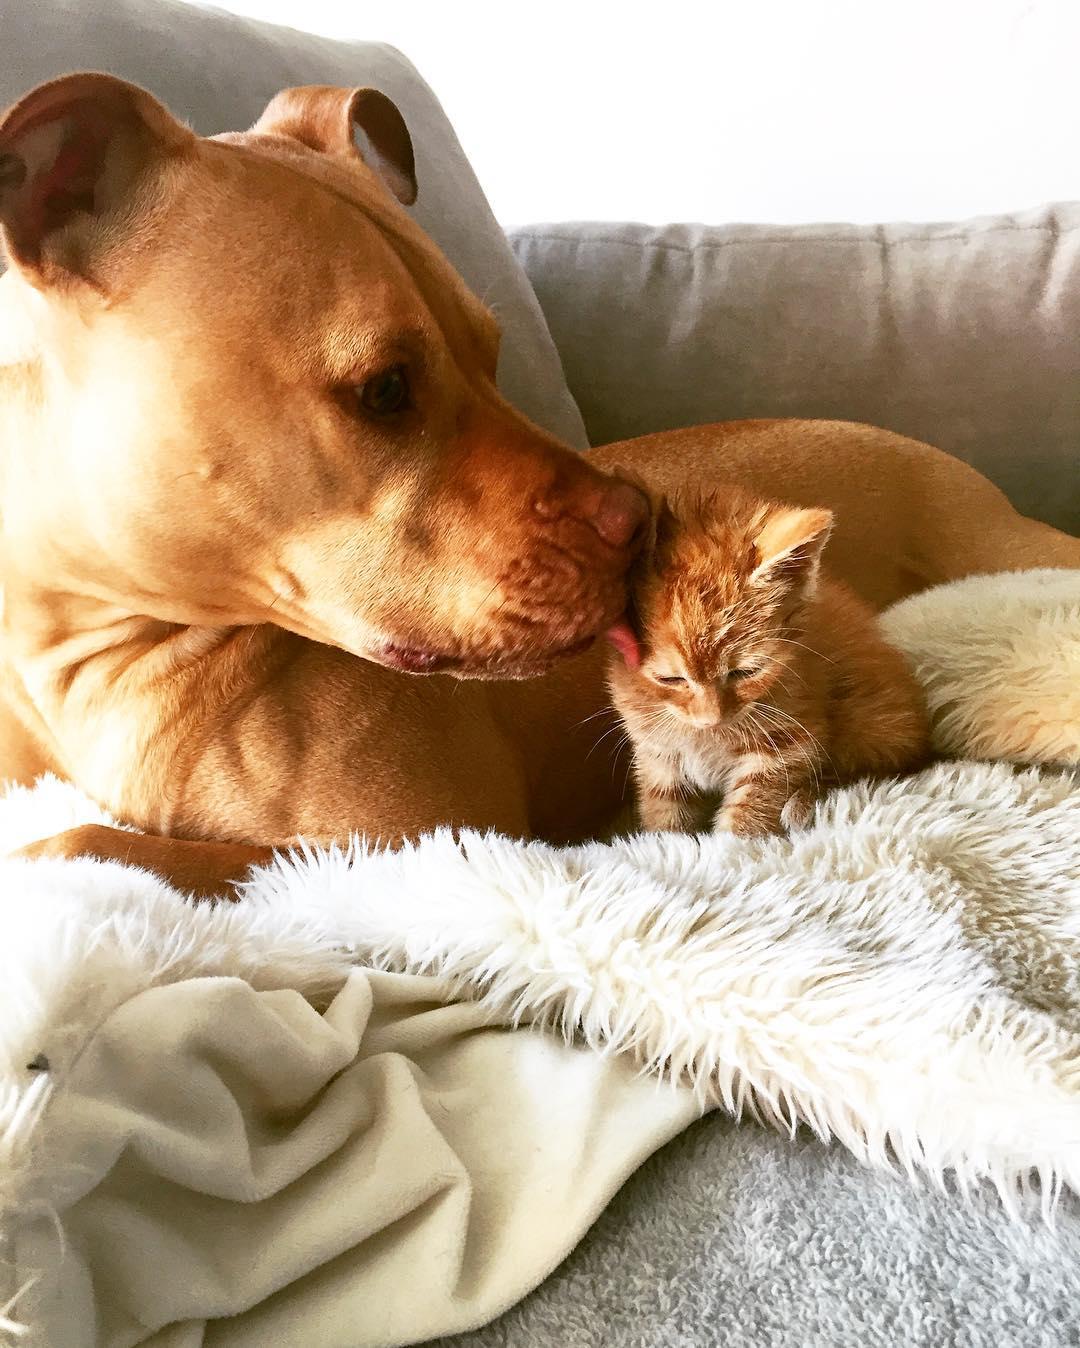 Imagem do dia - Página 15 Dog-likes-cats-ginger-pit-bull-bubba-loves-rue-7